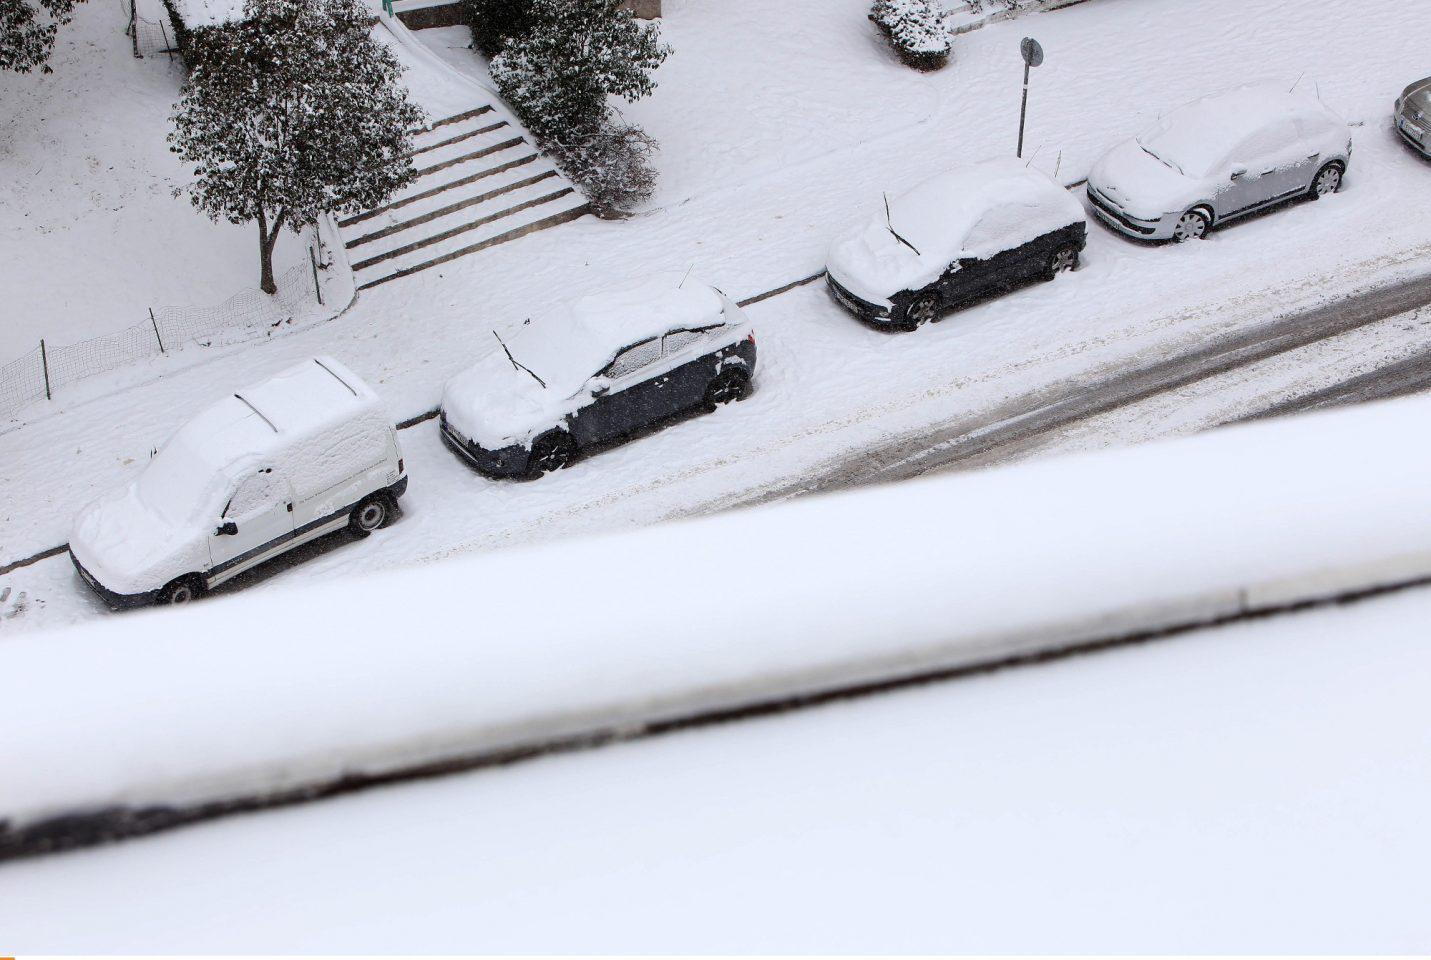 thessaloniki-xionia1-1300 Σε πόλη «φάντασμα» έχει μετατραπεί η Θεσσαλονίκη από το χιονιά – Χωρίς νερό και θέρμανση πολλές περιοχές